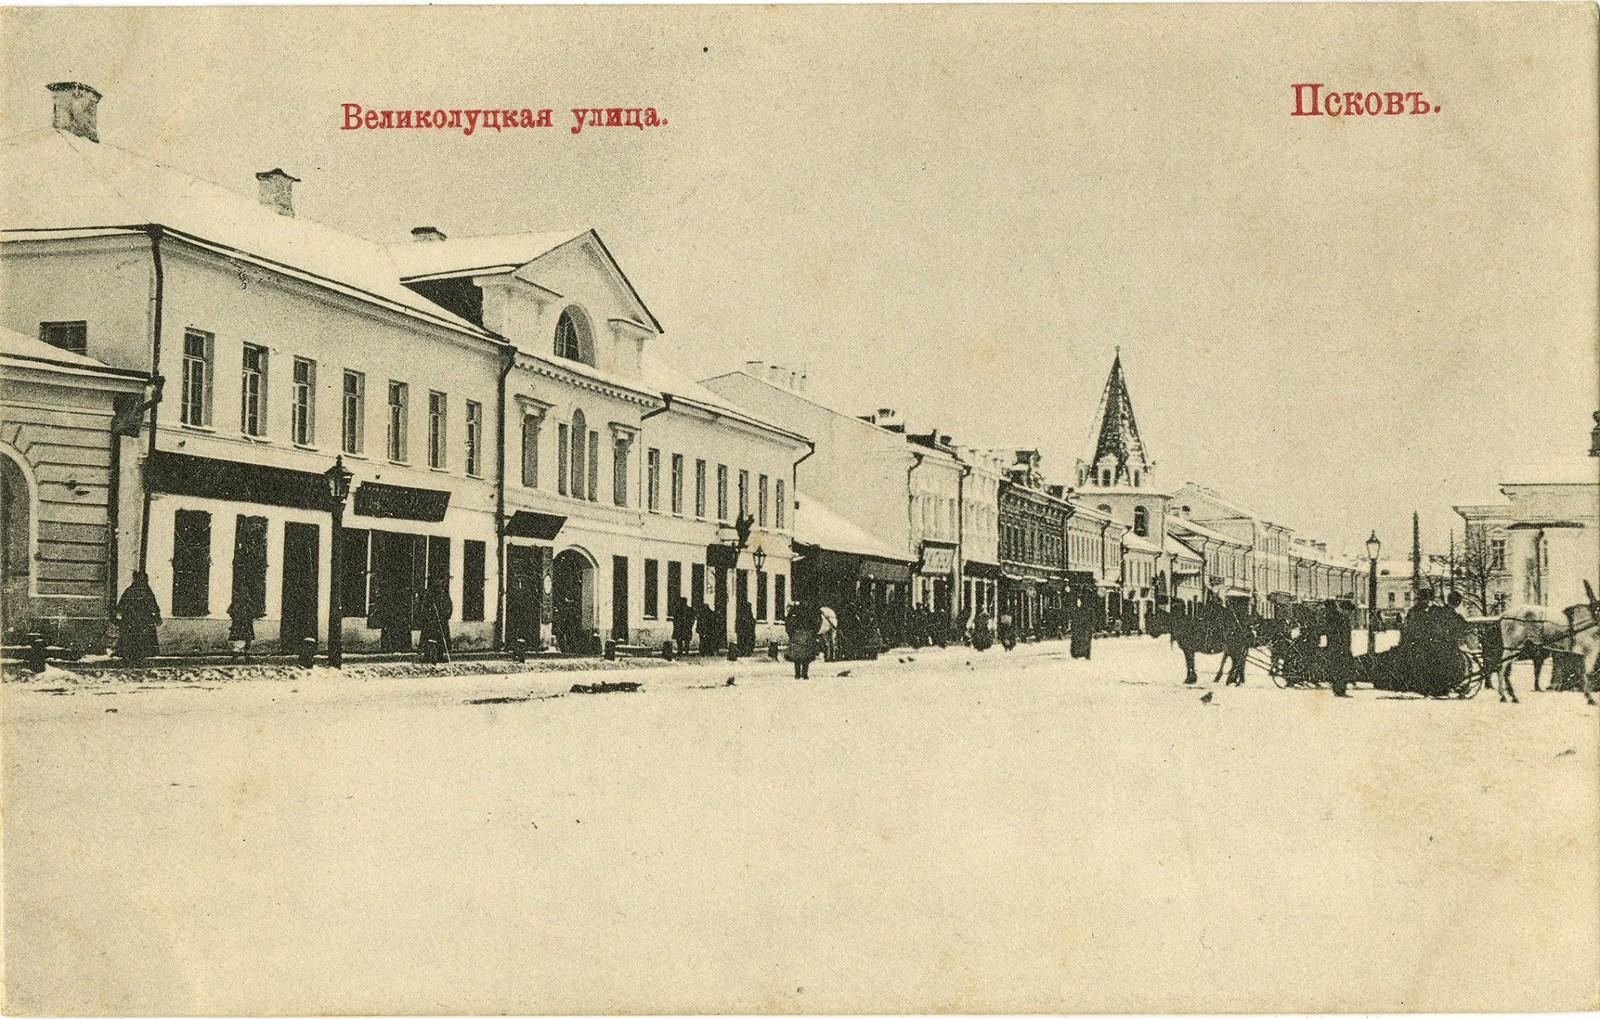 Великолуцкая улица.1